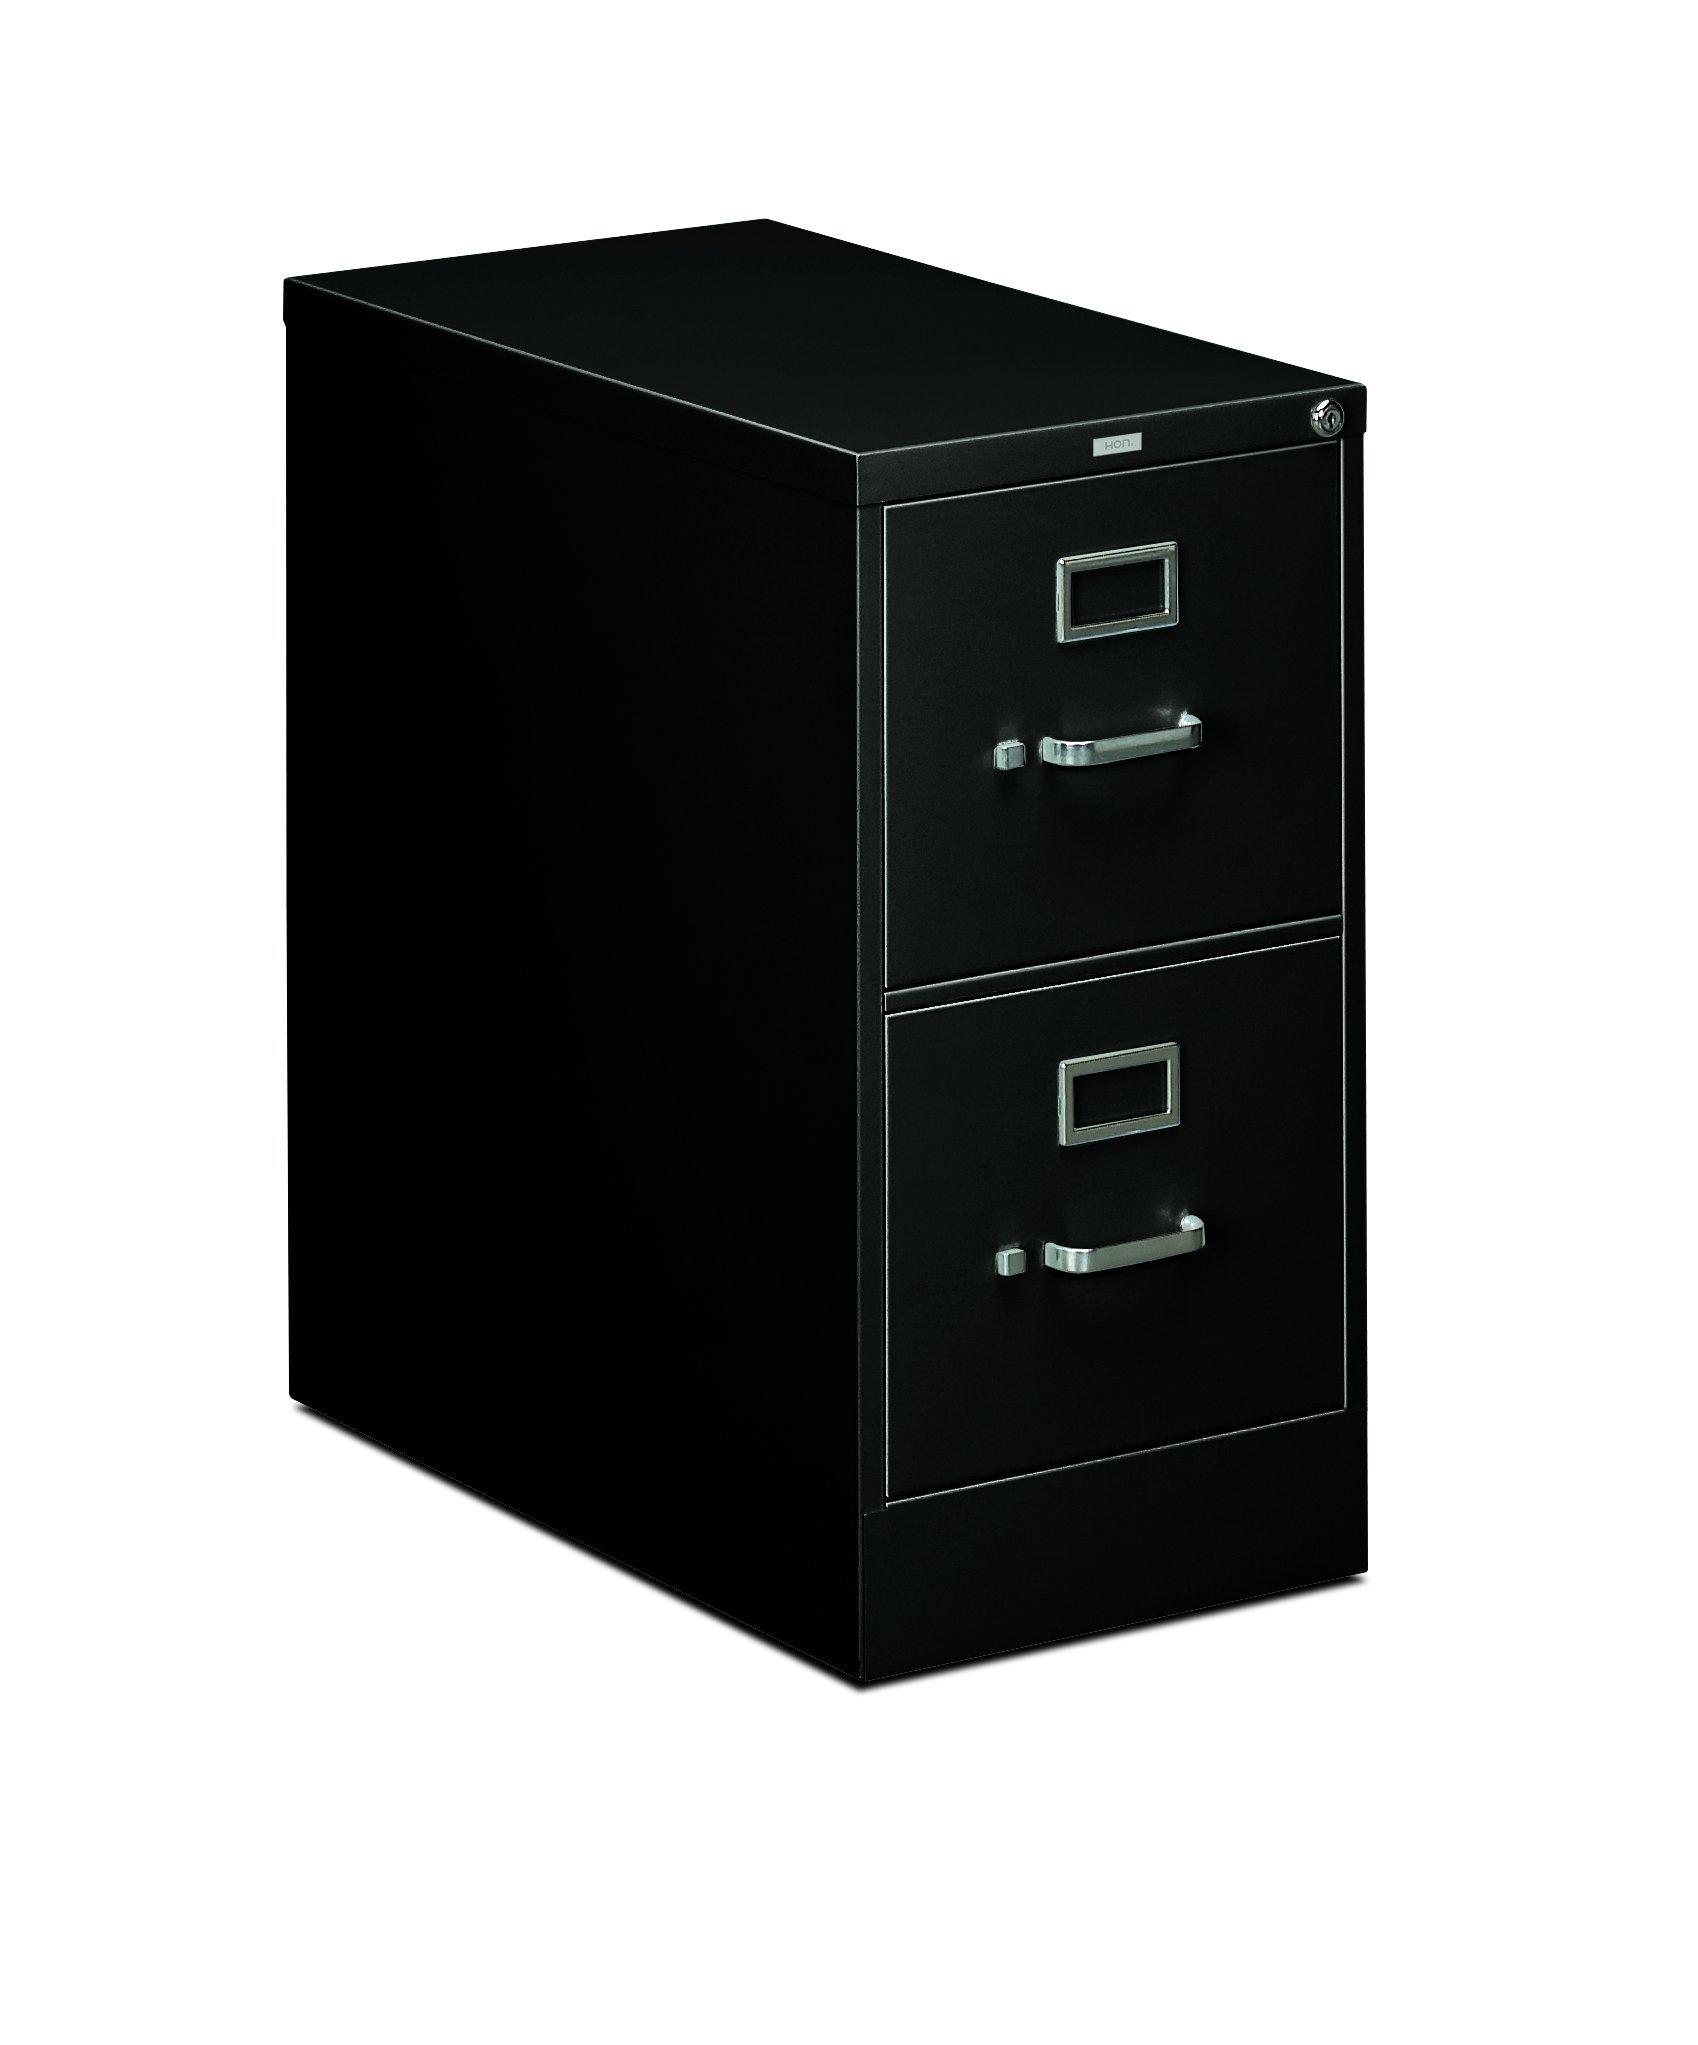 HON 2-Drawer Office Filing Cabinet - 310 Series Full-Suspension Letter File Cabinet, 26.5''D, Black (H312) by HON